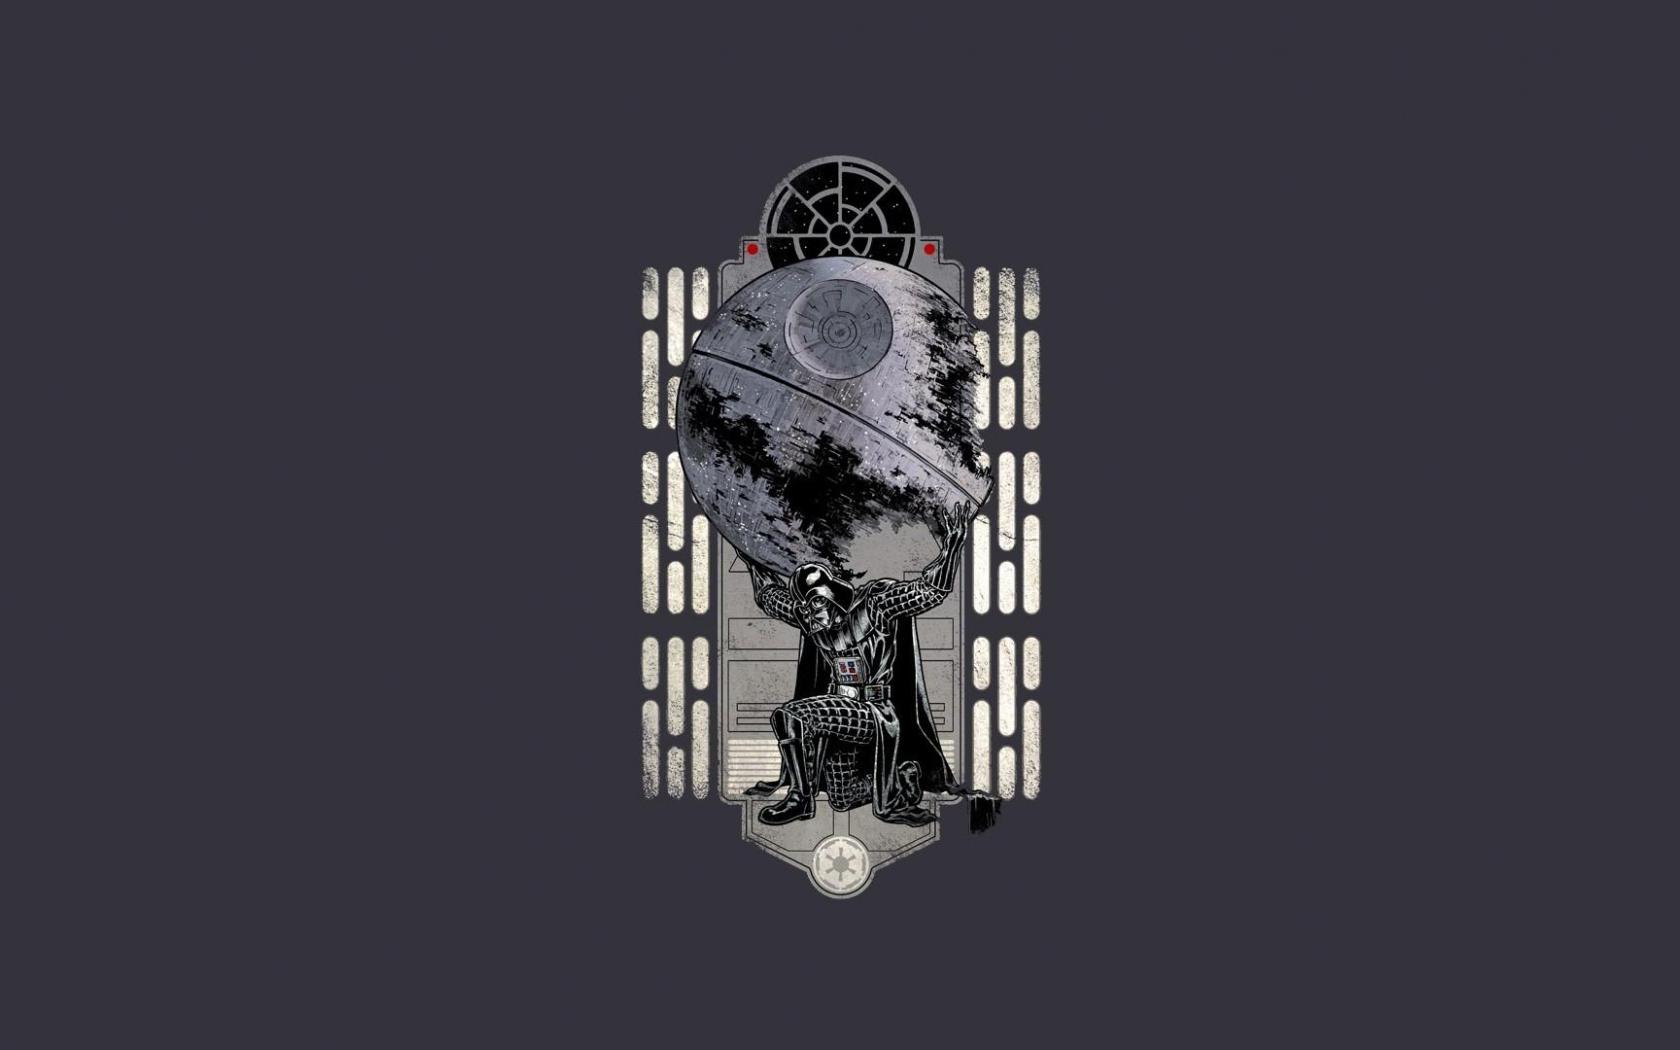 Free Download Darth Vader Star Wars Atlas Wallpaper 89007 1920x1080 For Your Desktop Mobile Tablet Explore 46 Star Wars Tablet Wallpaper Free Star Wars Wallpaper Downloads Star Wars Hd